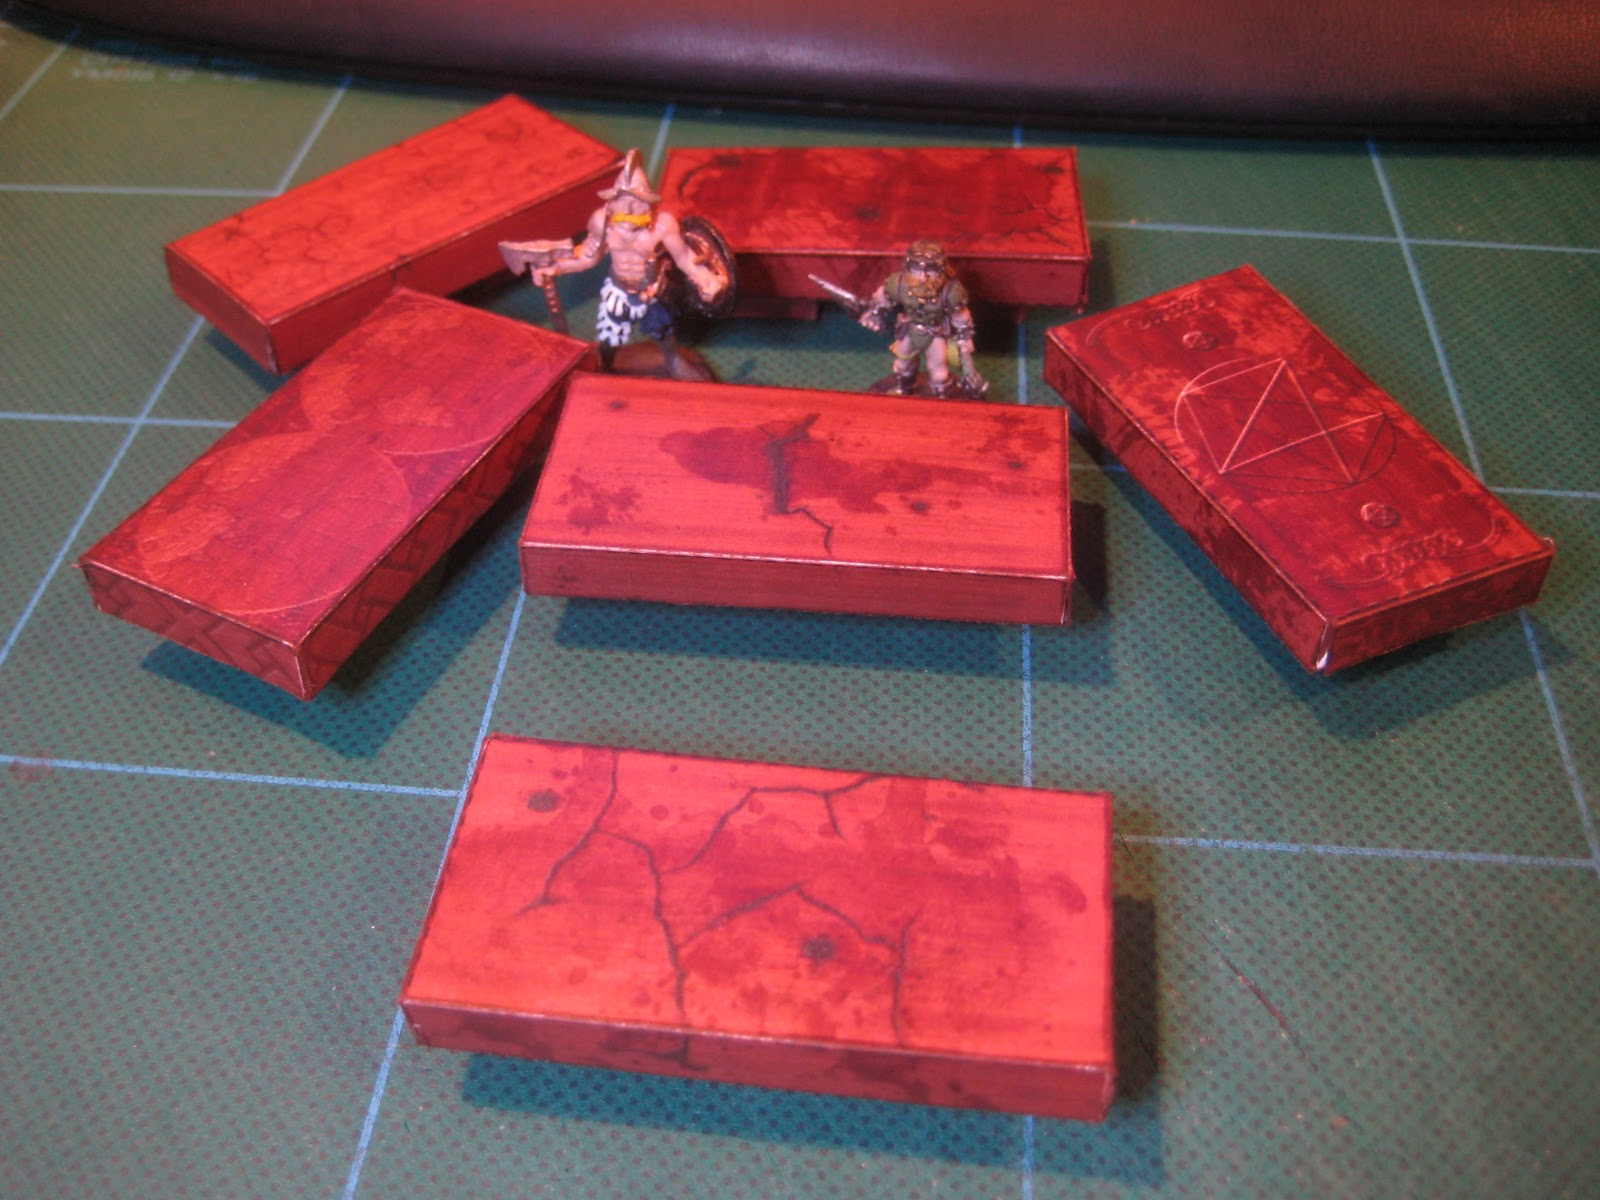 http://2.bp.blogspot.com/_REg-LhD7u8I/TLJ5OMG9bTI/AAAAAAAAX68/OFNNJkYxzeA/s1600/paper_models_longtable_action.JPG